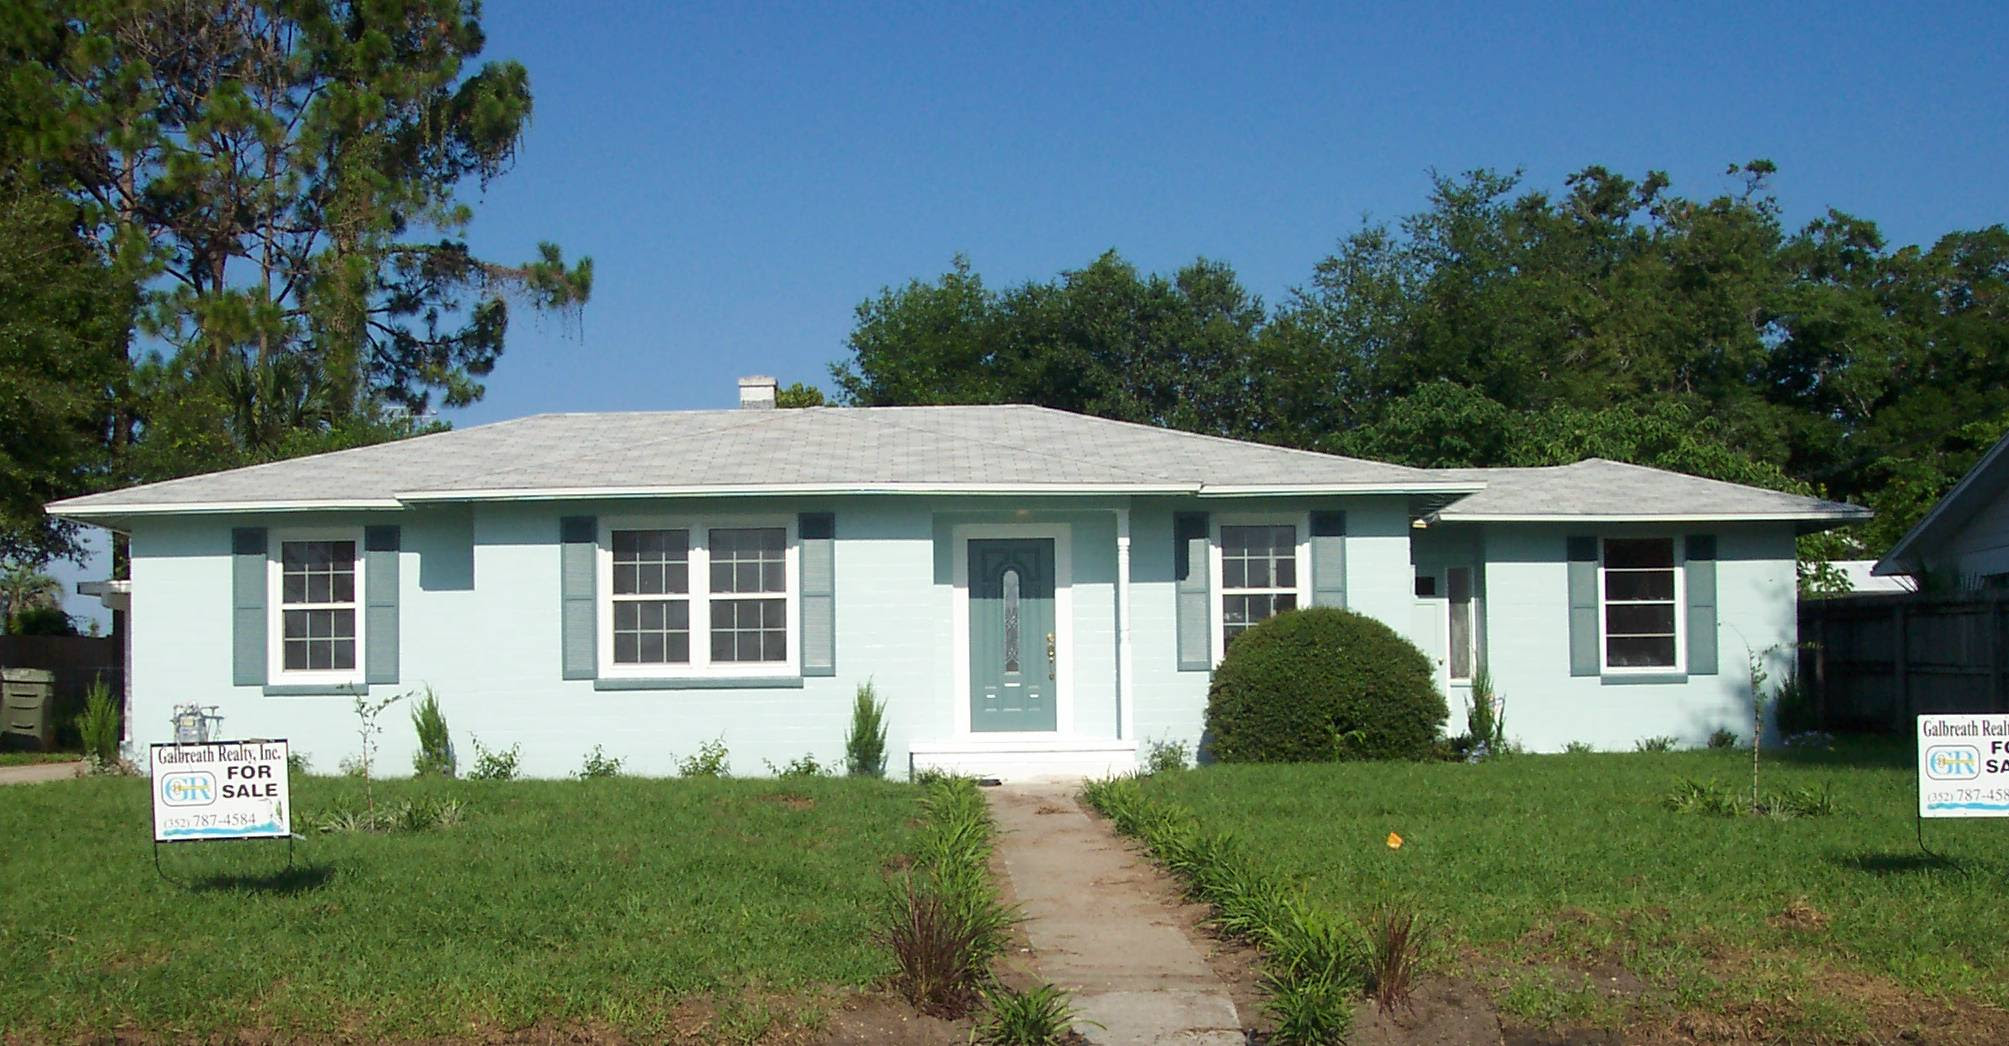 2 Bedroom Houses For Rent In Orlando Fl Wallpaper Home